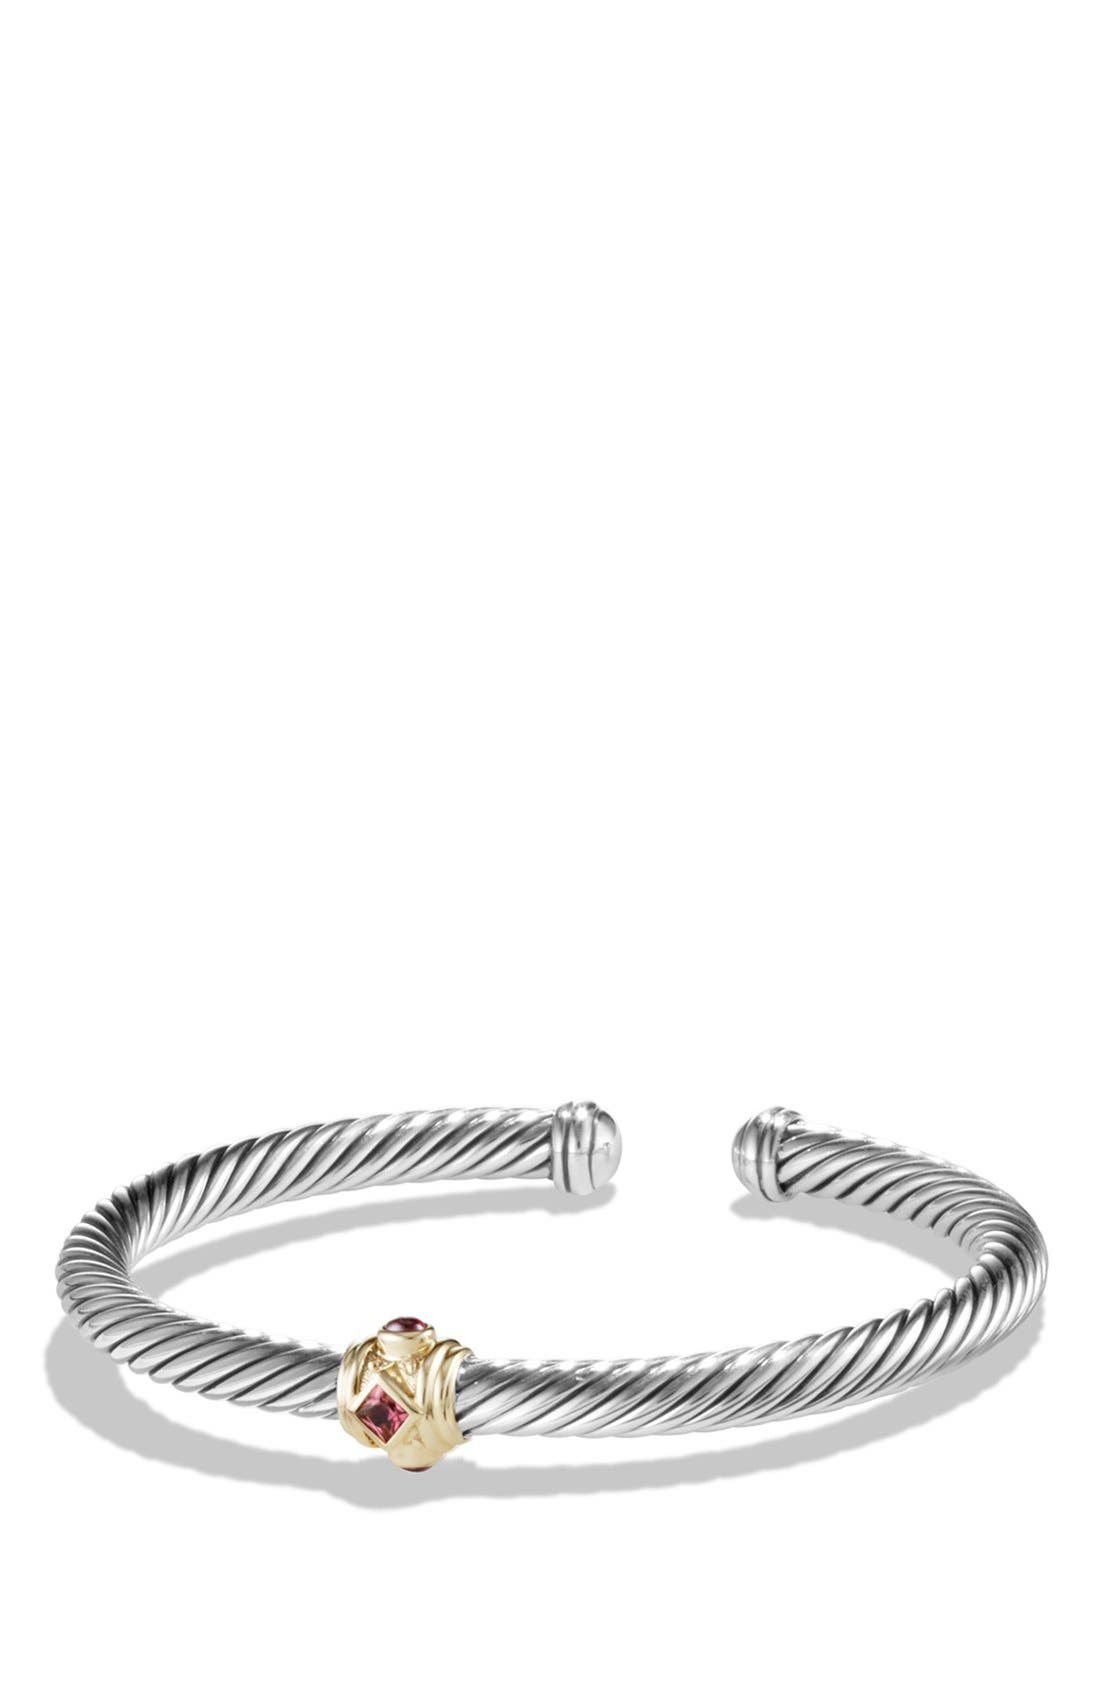 Renaissance Bracelet with Semiprecious Stones & 14K Gold, 5mm,                         Main,                         color, Pink Tourmaline